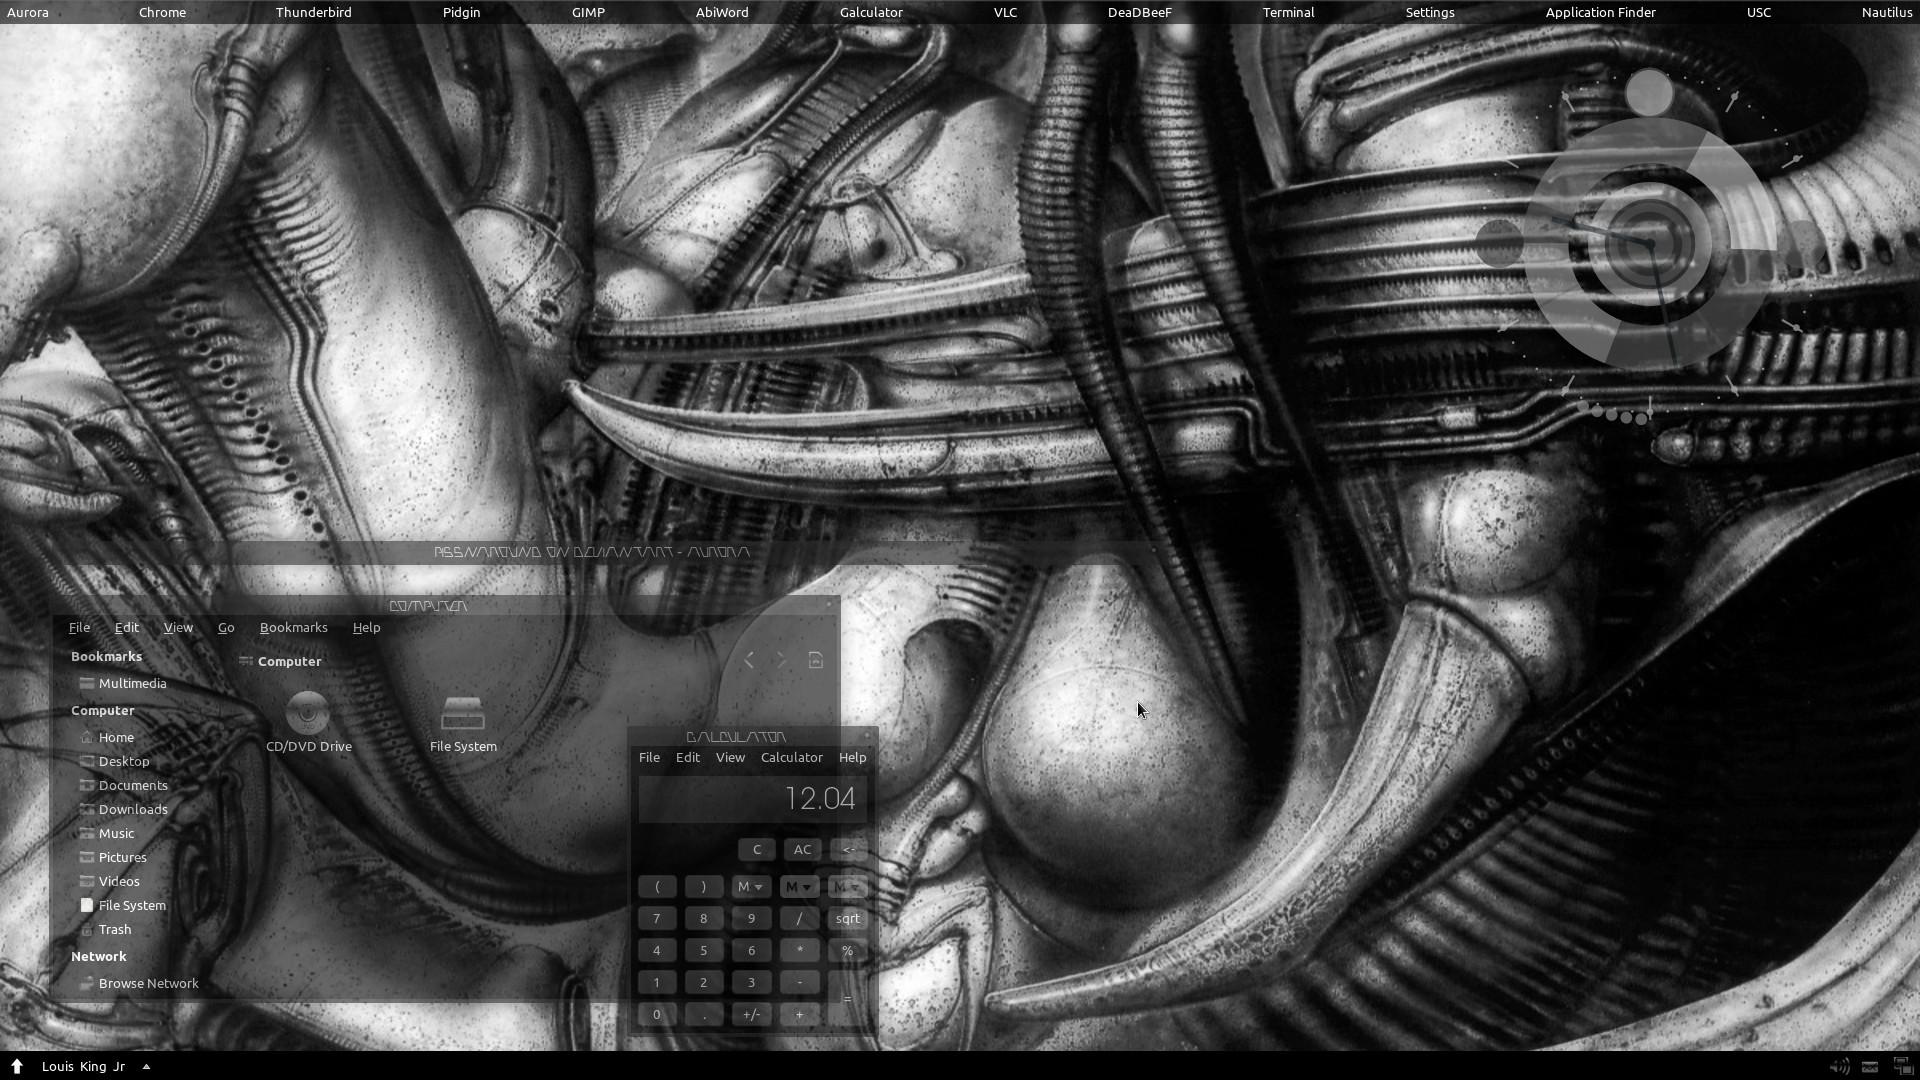 H. R. Giger by pissnaround H. R. Giger by pissnaround